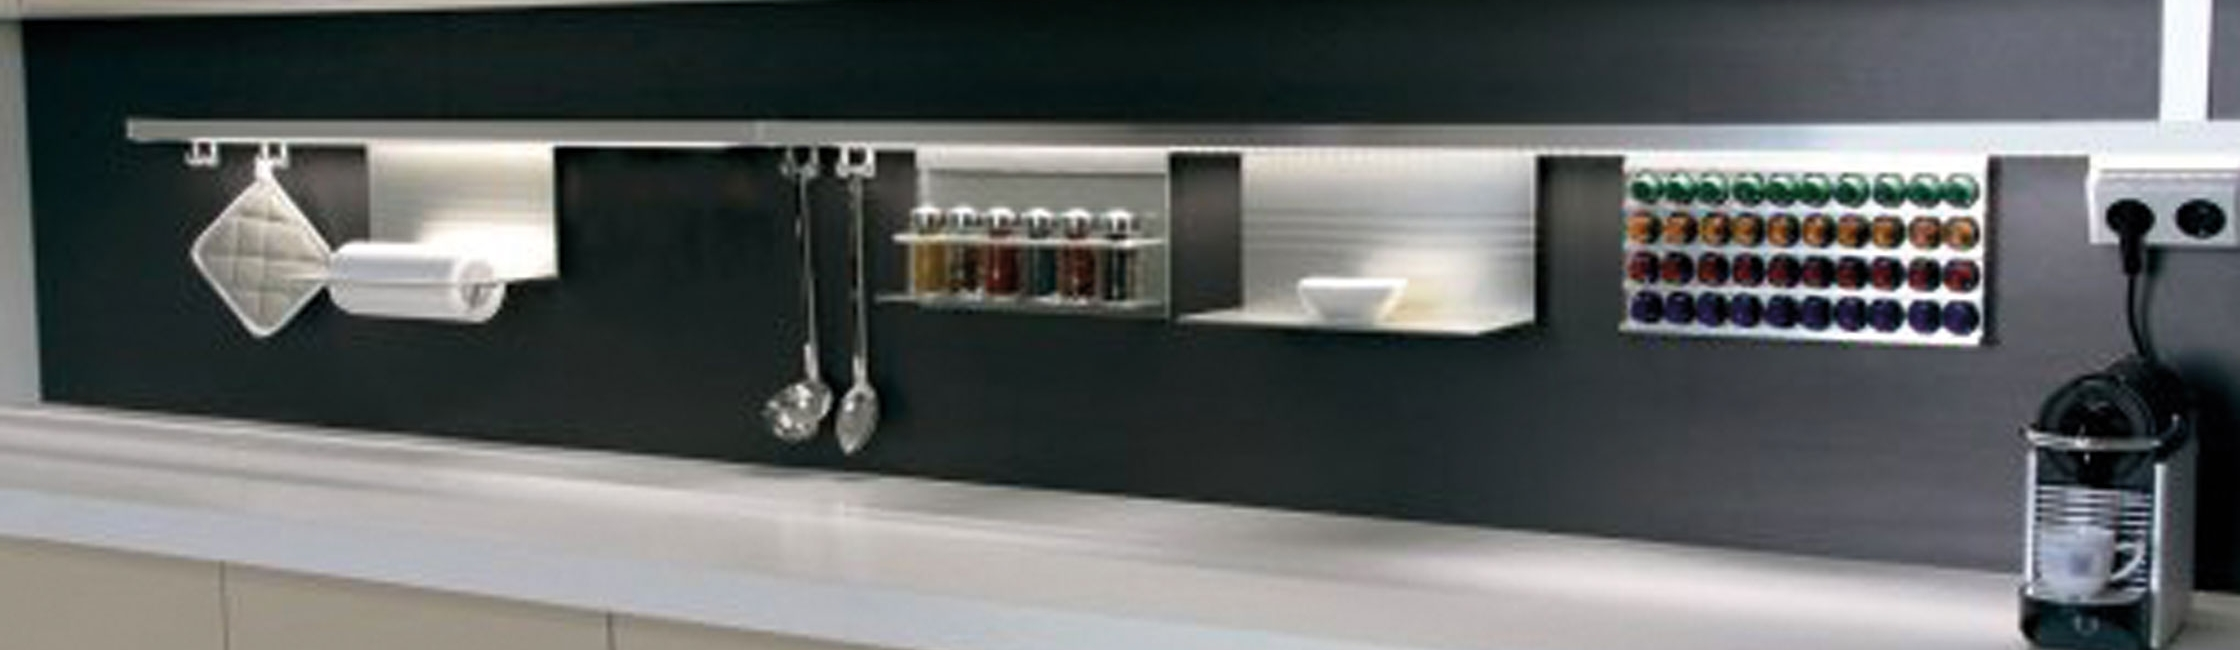 Msa accessoires cuisine latest ferrure complte lemans ii - Msa accessoires cuisine ...